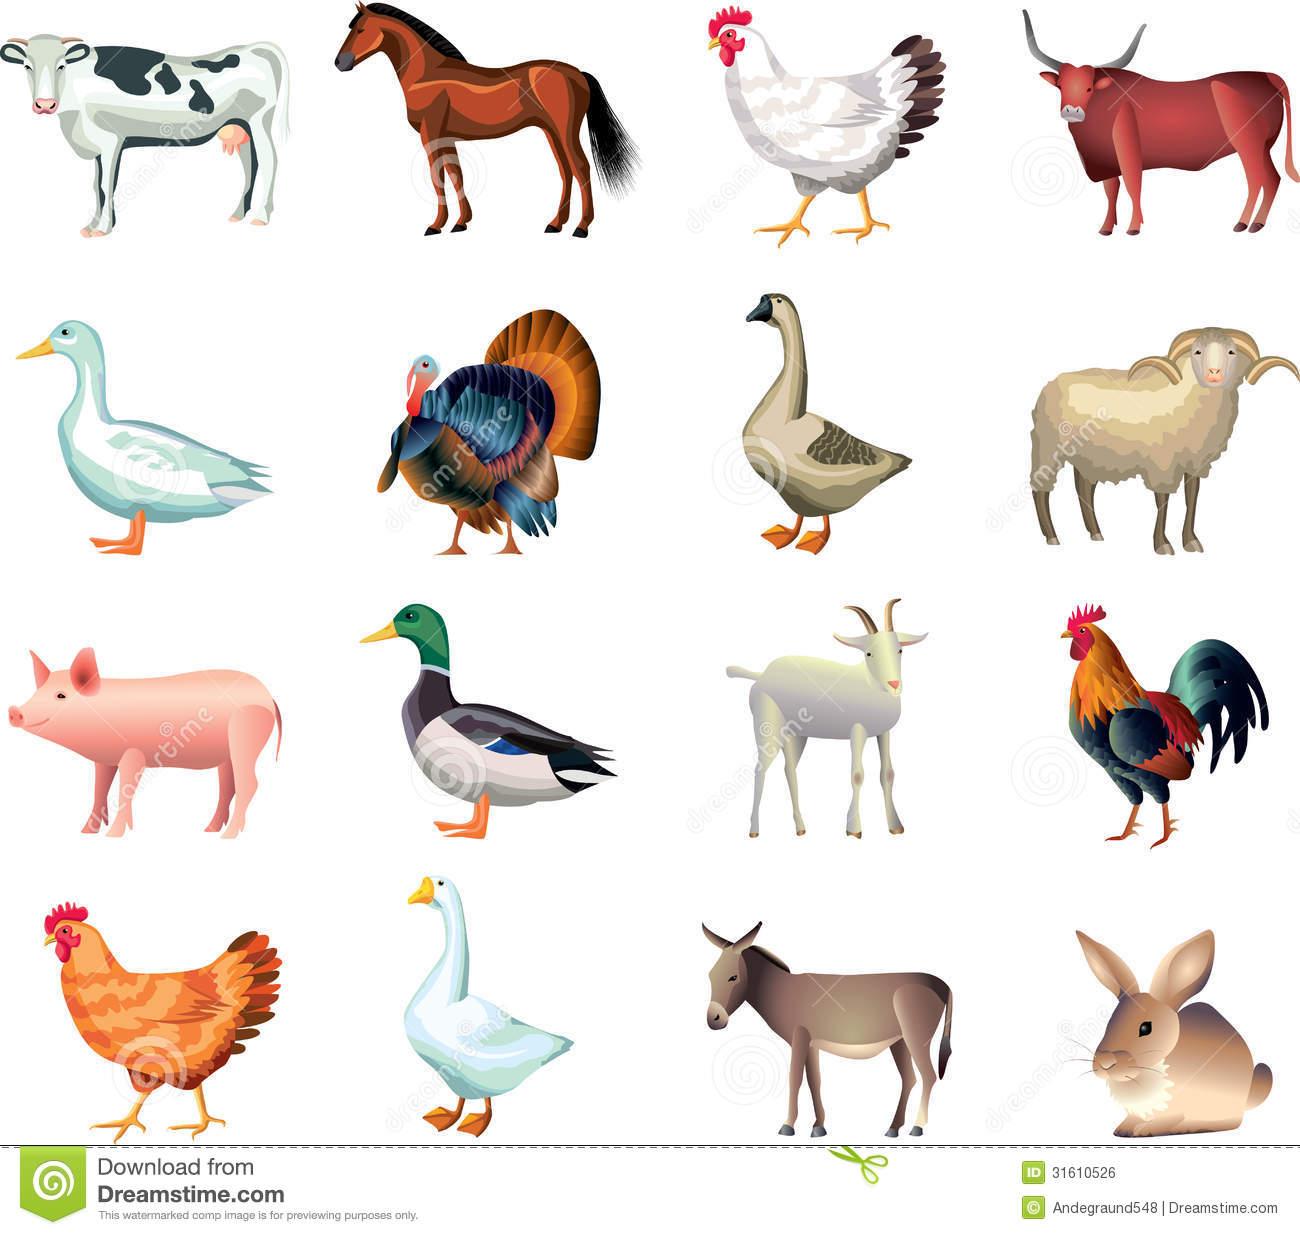 Farm animals clipart 10 » Clipart Station.